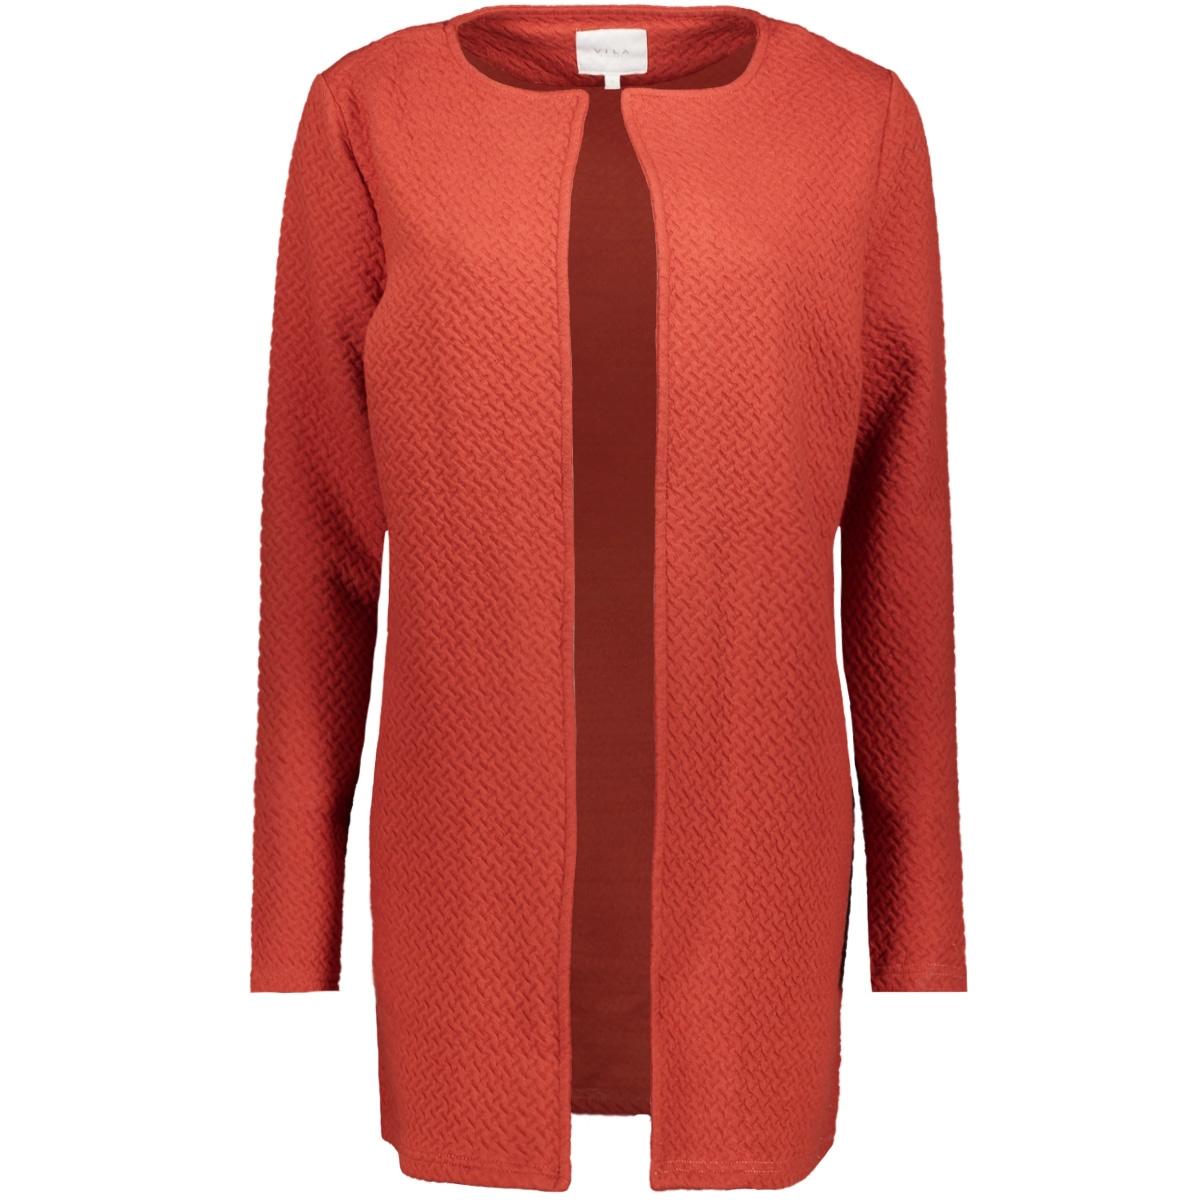 vinaja new long jacket-fav 14043894 vila vest ketchup